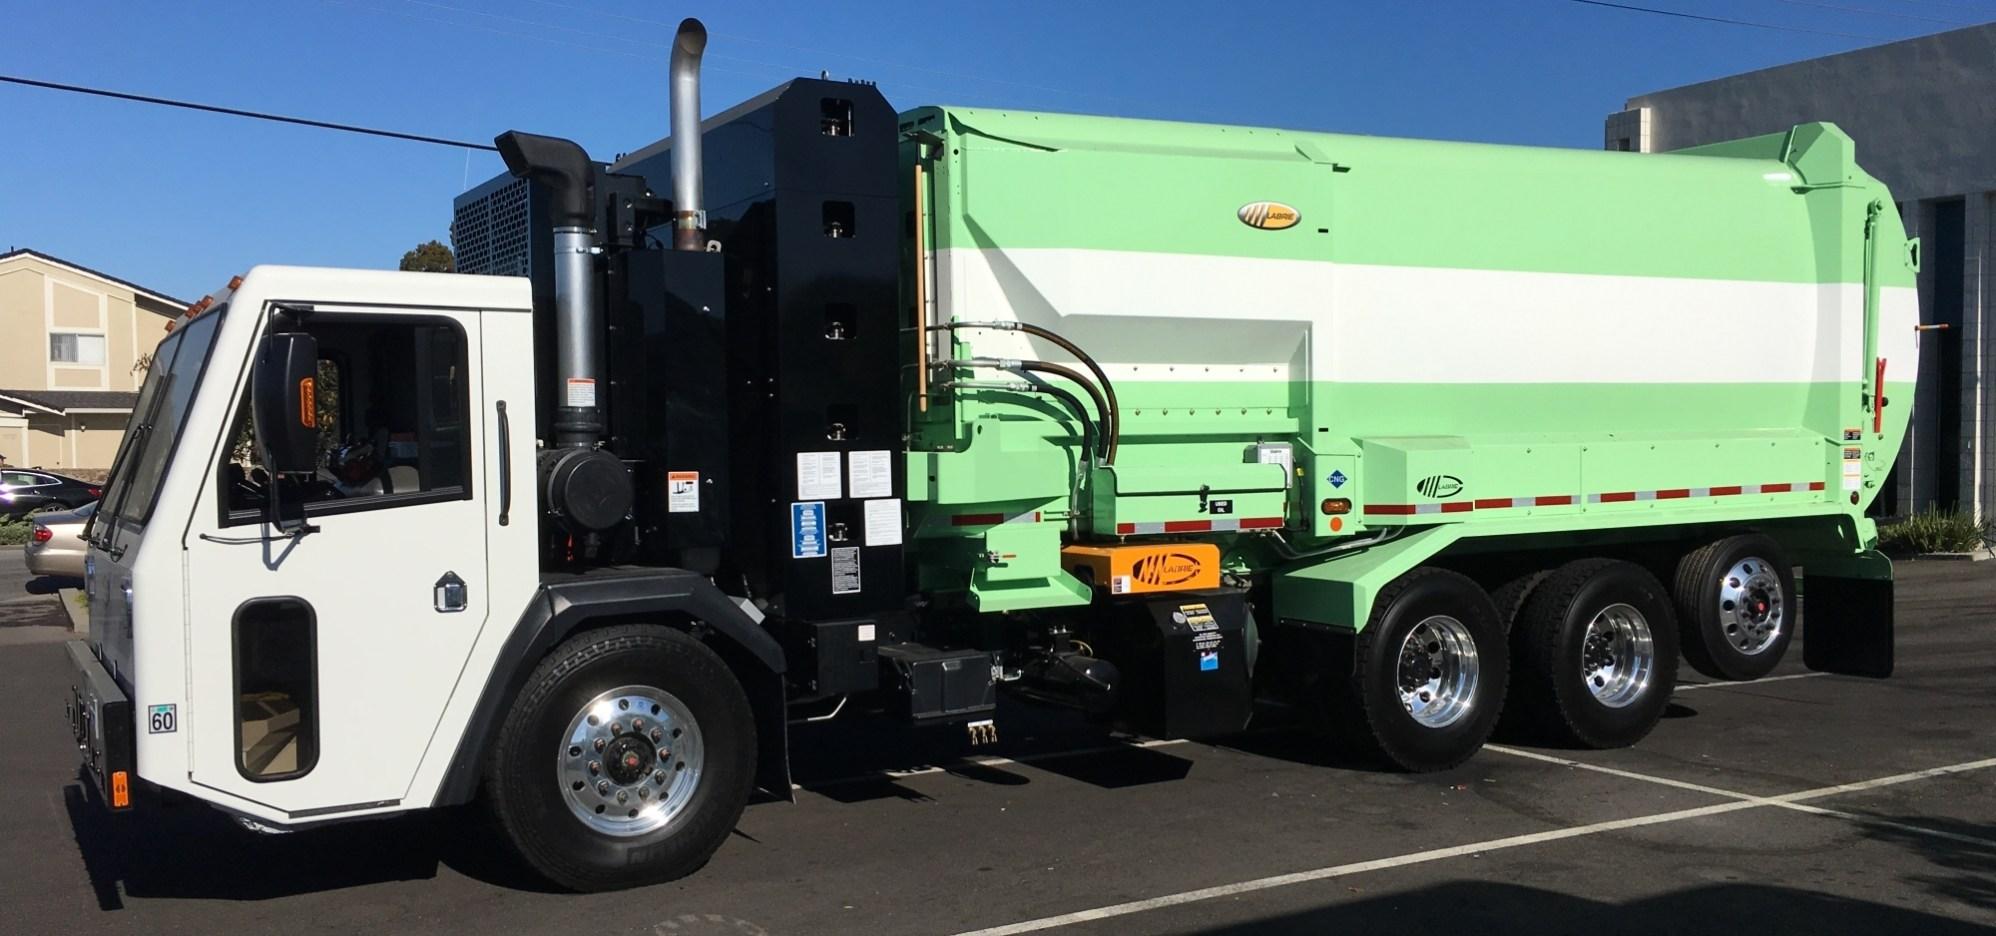 tri-ced-recycling-fleet-wraps-10